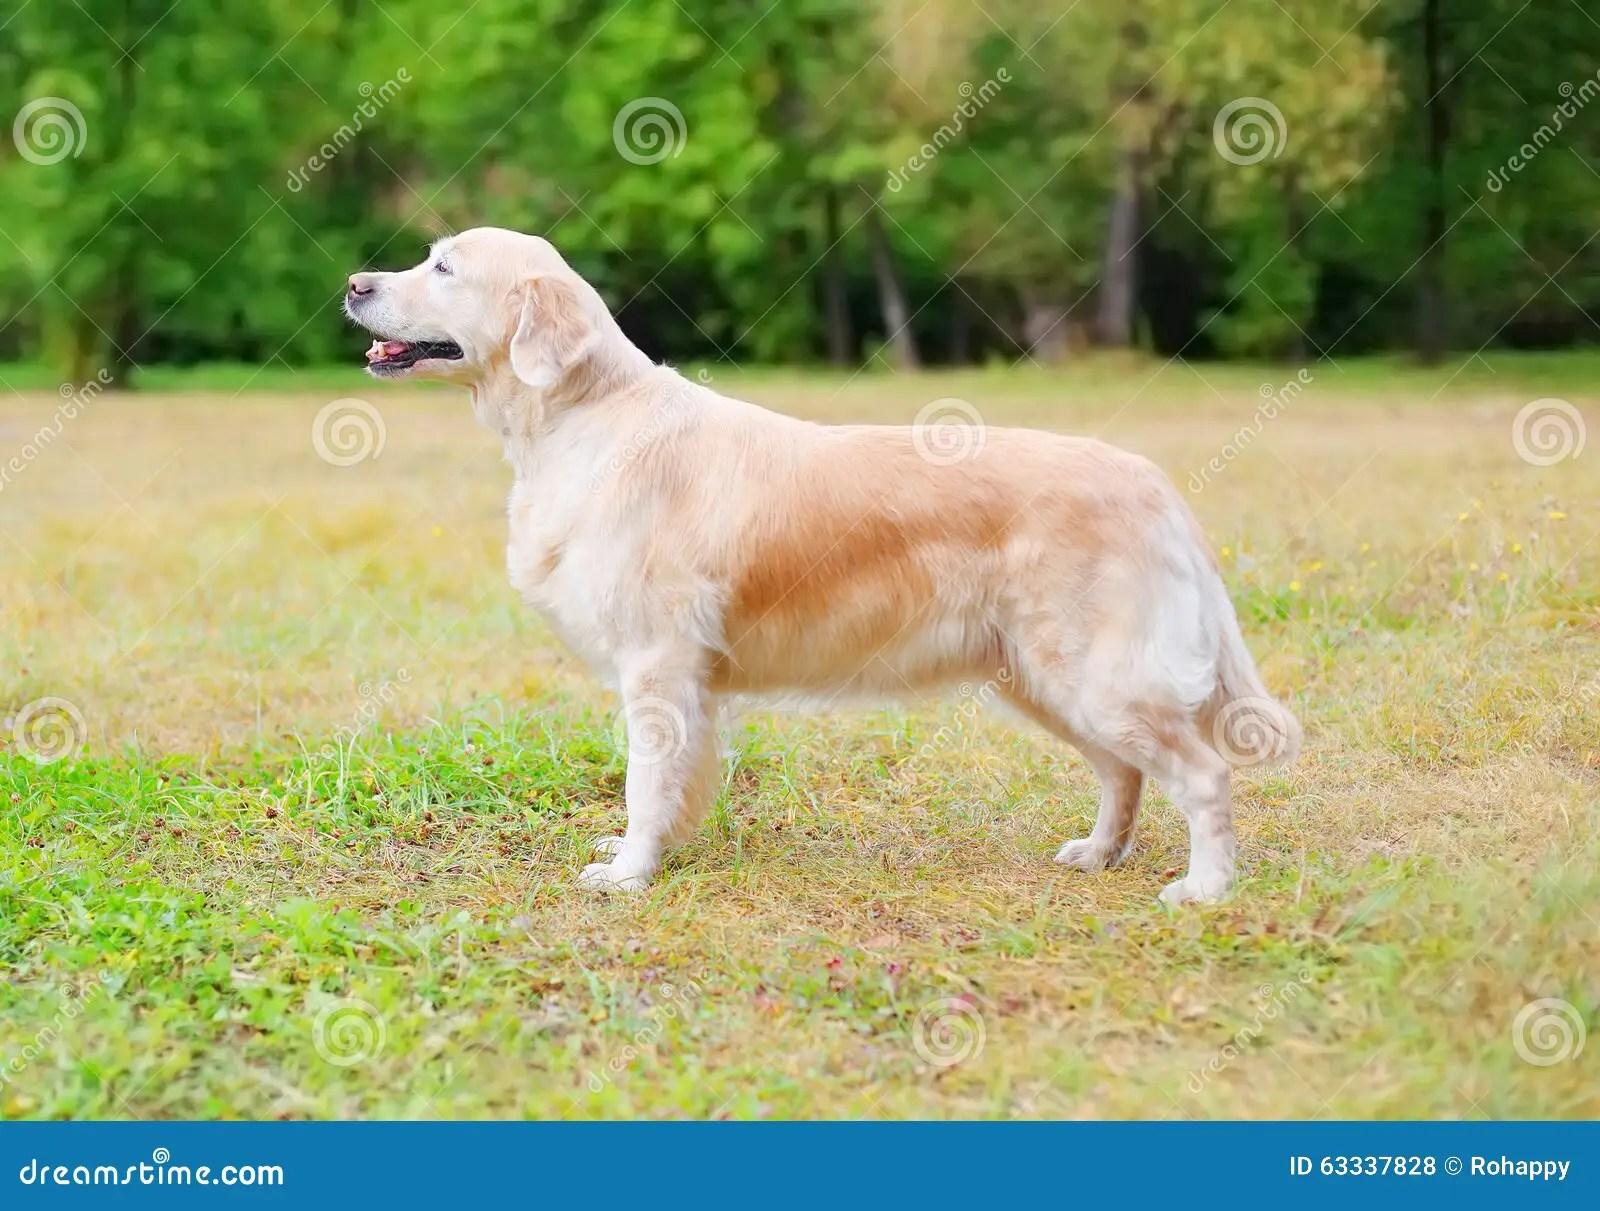 Happy Golden Retriever Dog Standing On Grass In Park